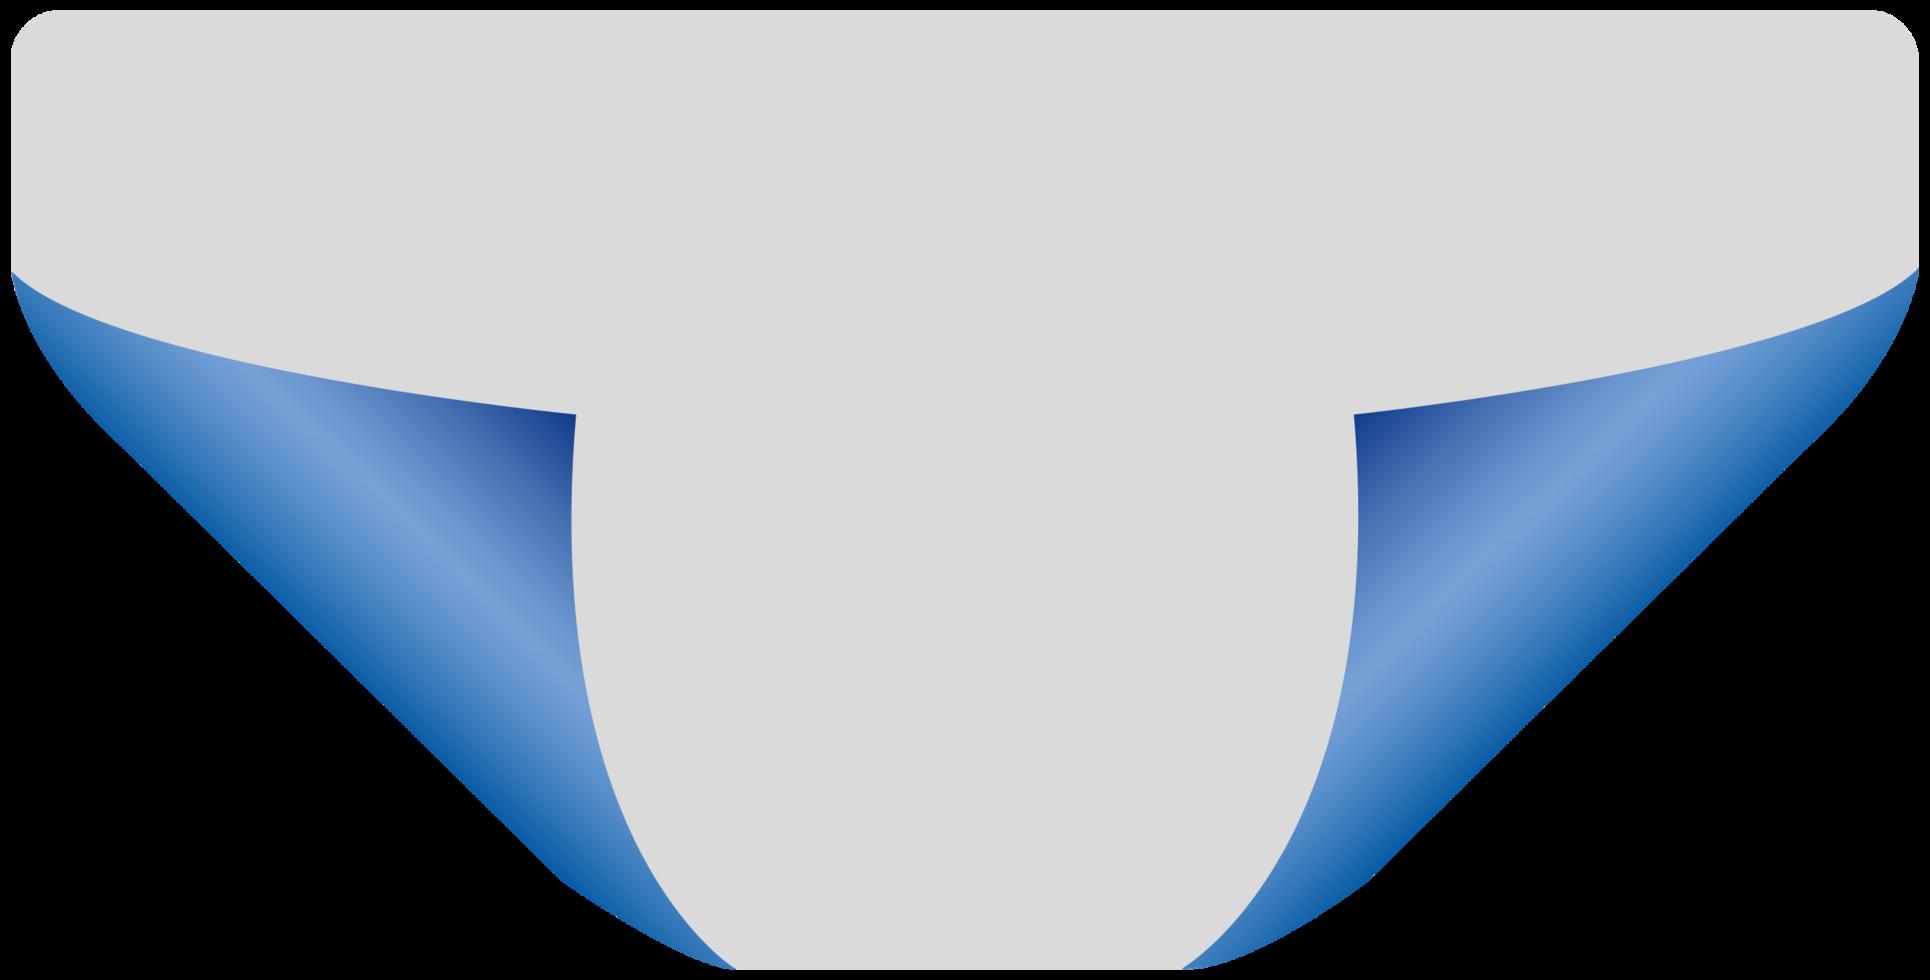 rektangelpapper png